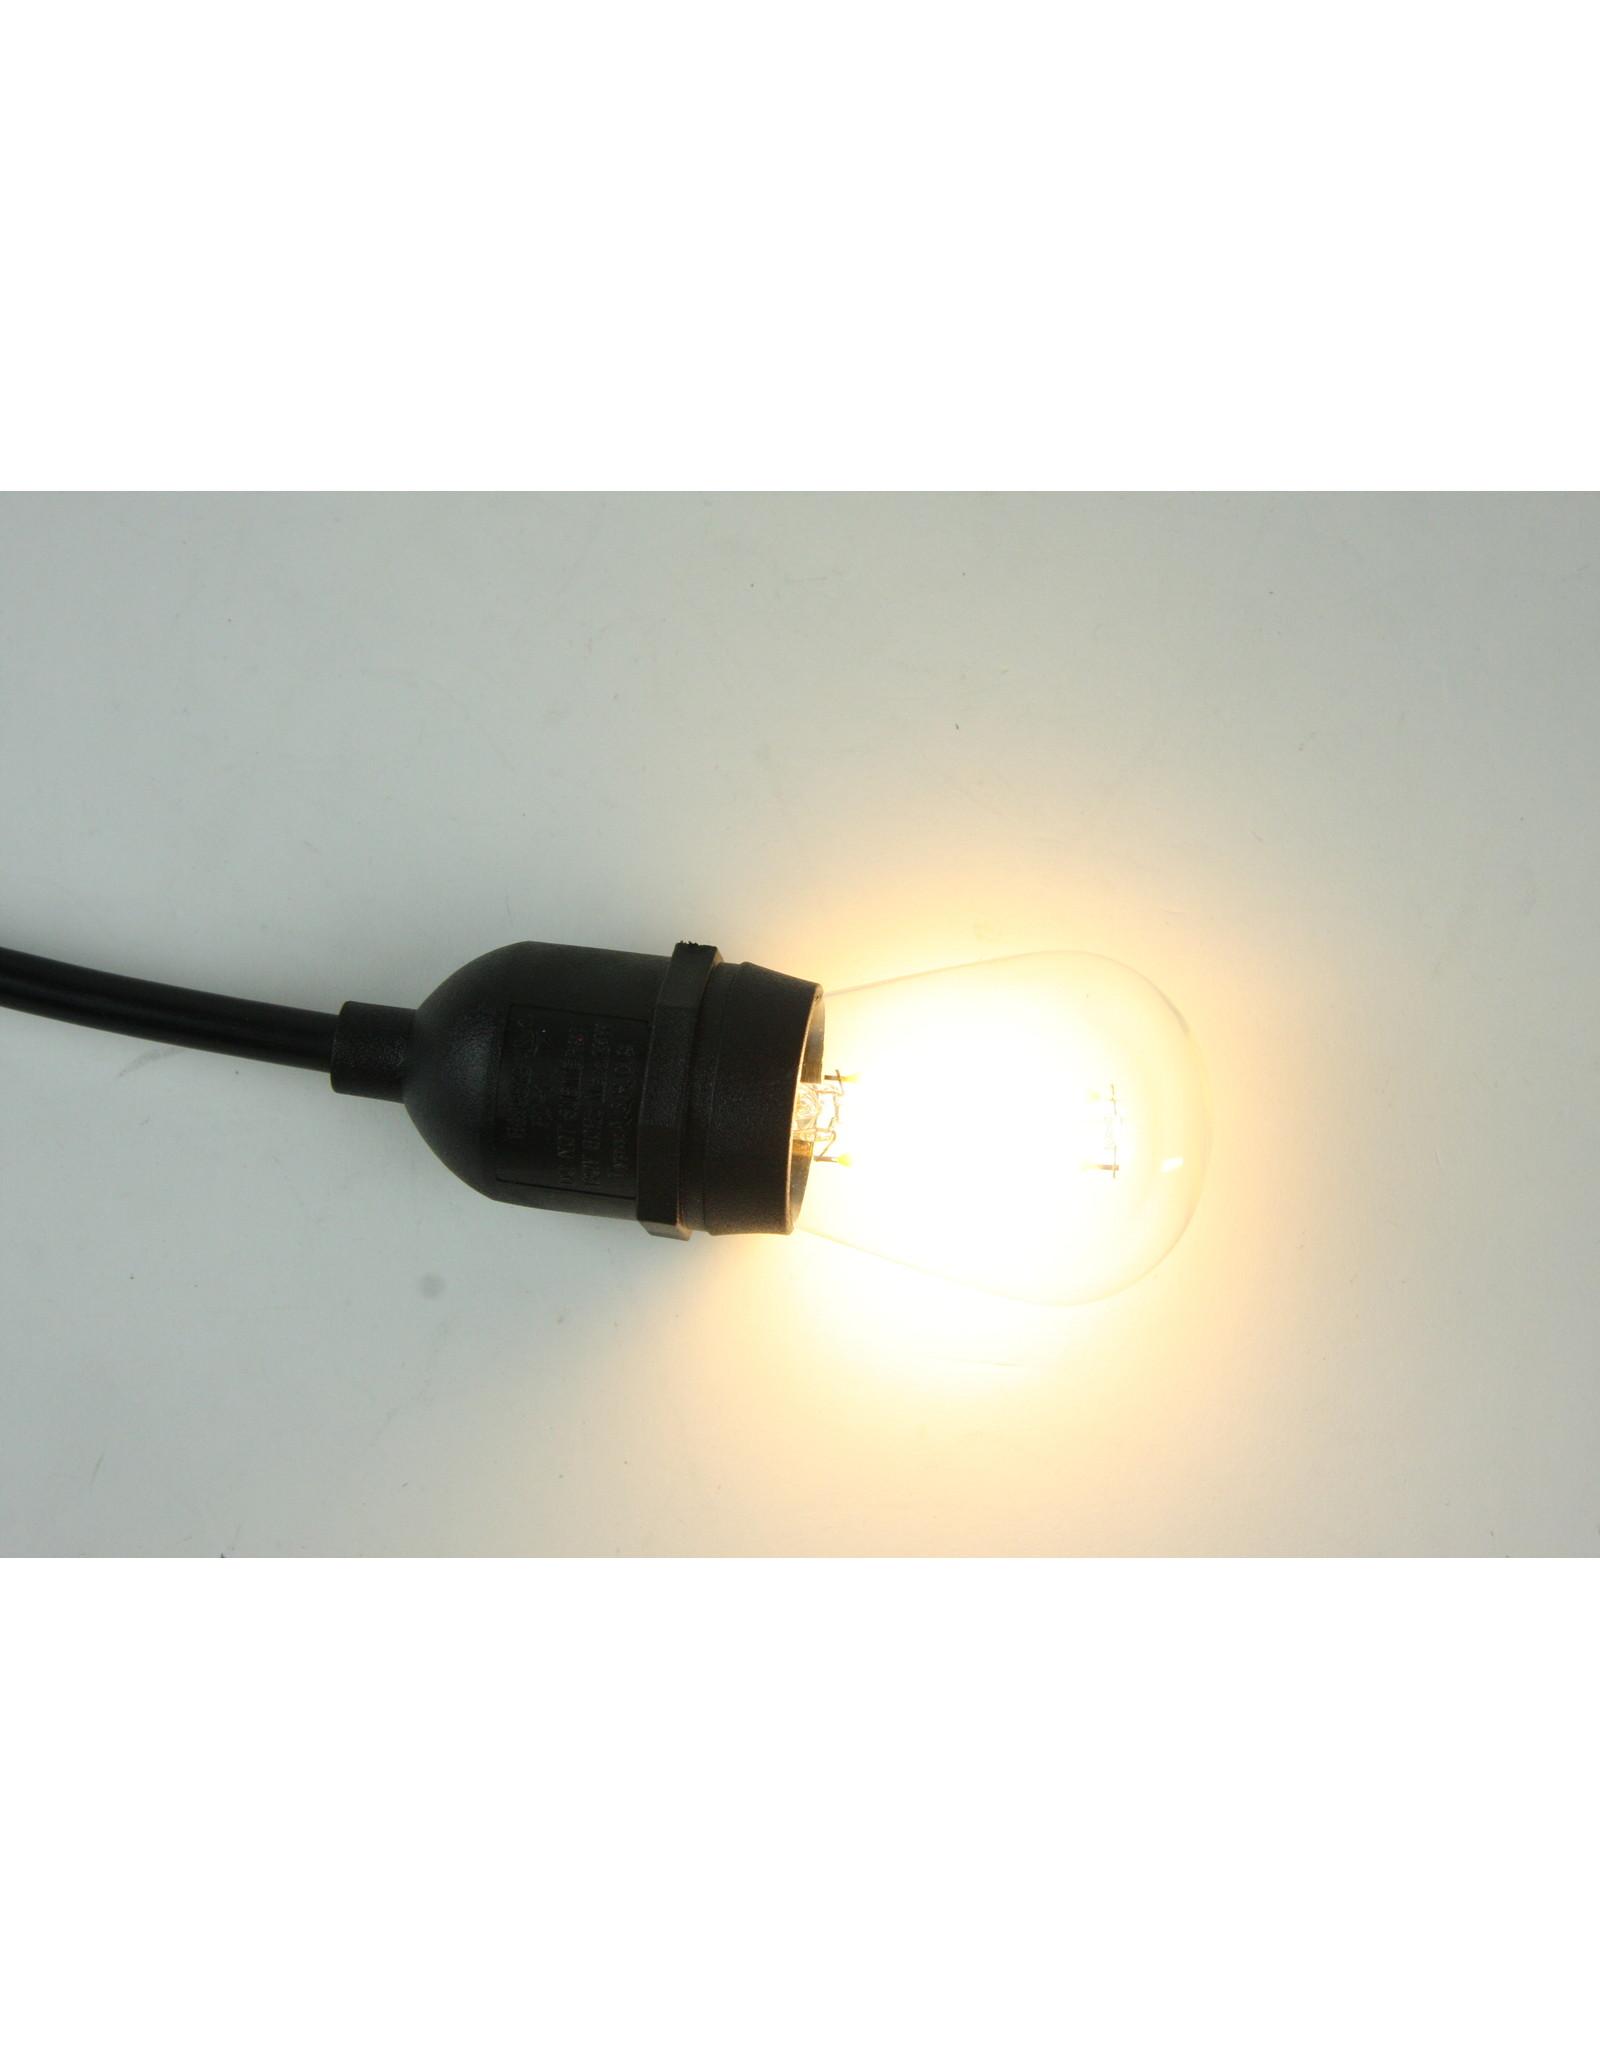 Lights Led filament lamp e27, s14 model, 2w, warm white, 2700k, unbreakable plastic